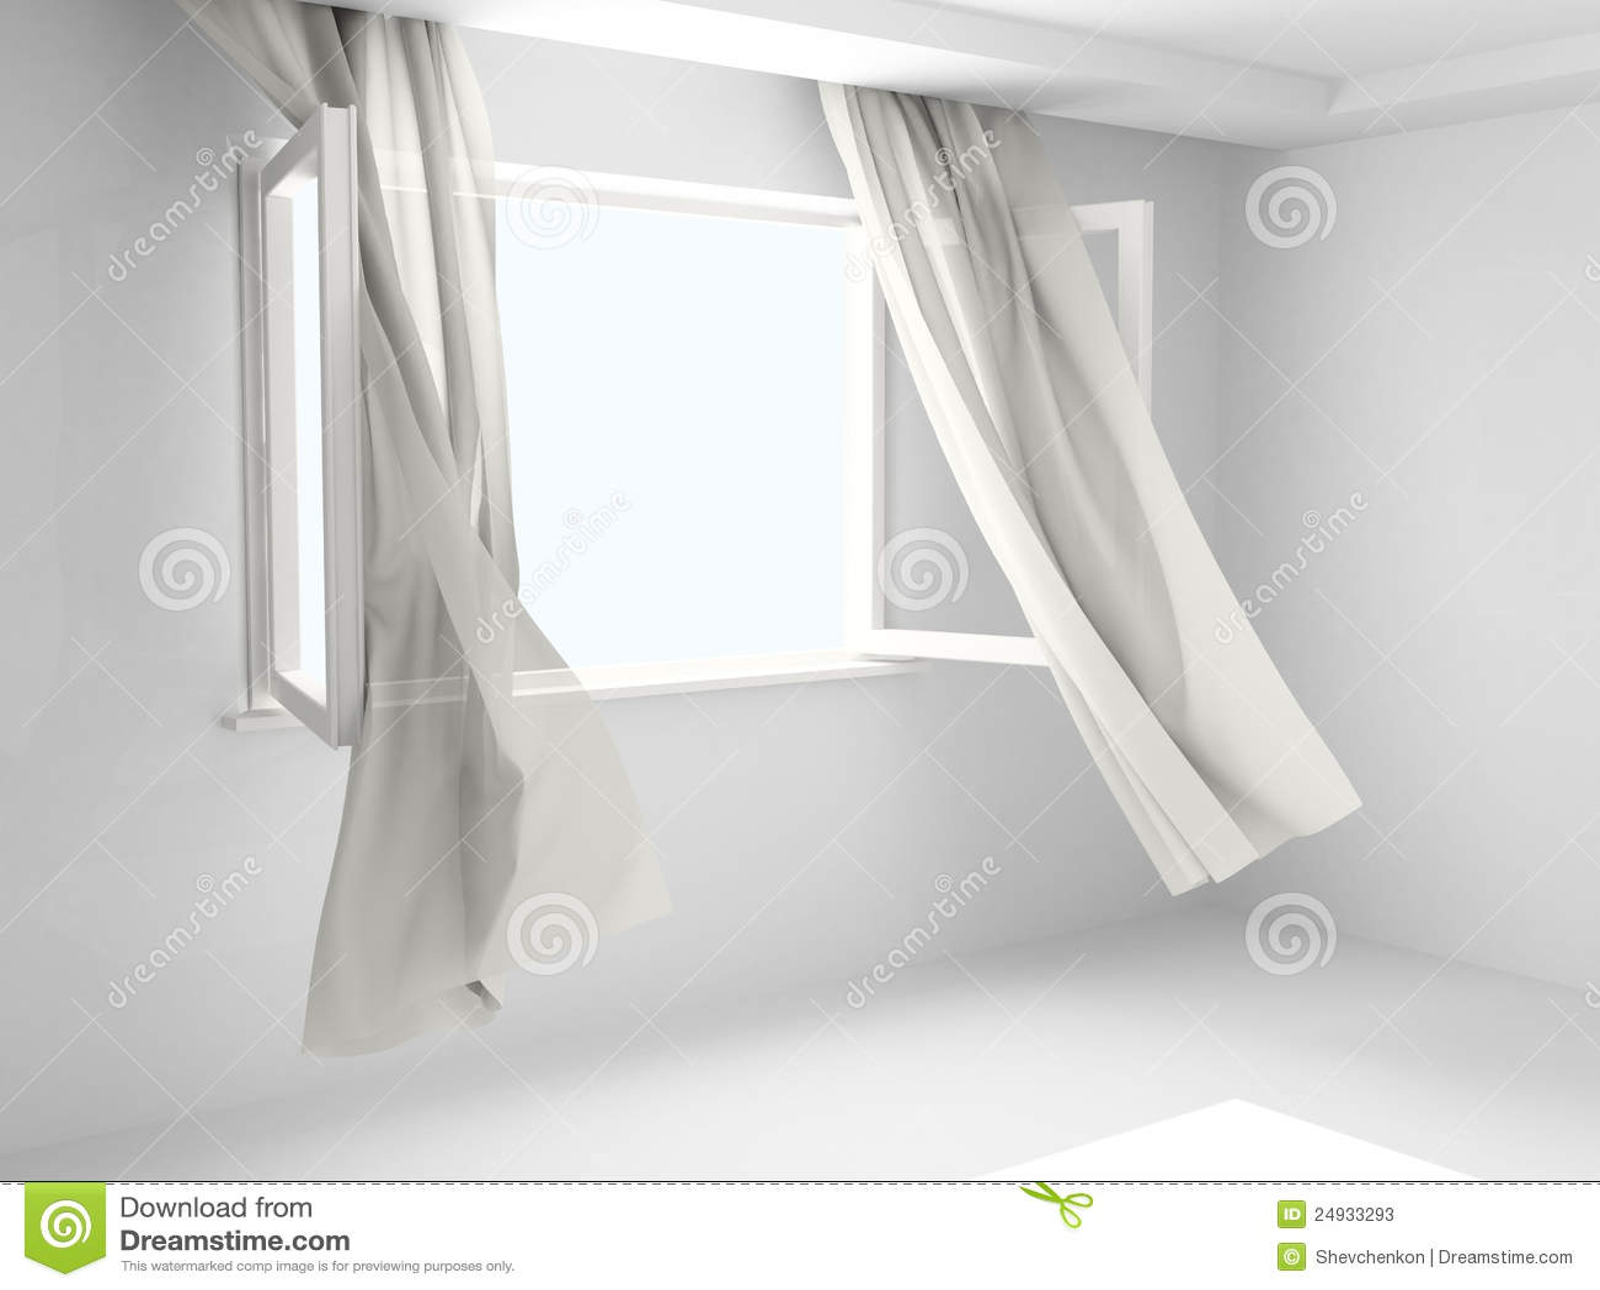 Curtains for small bathroom window